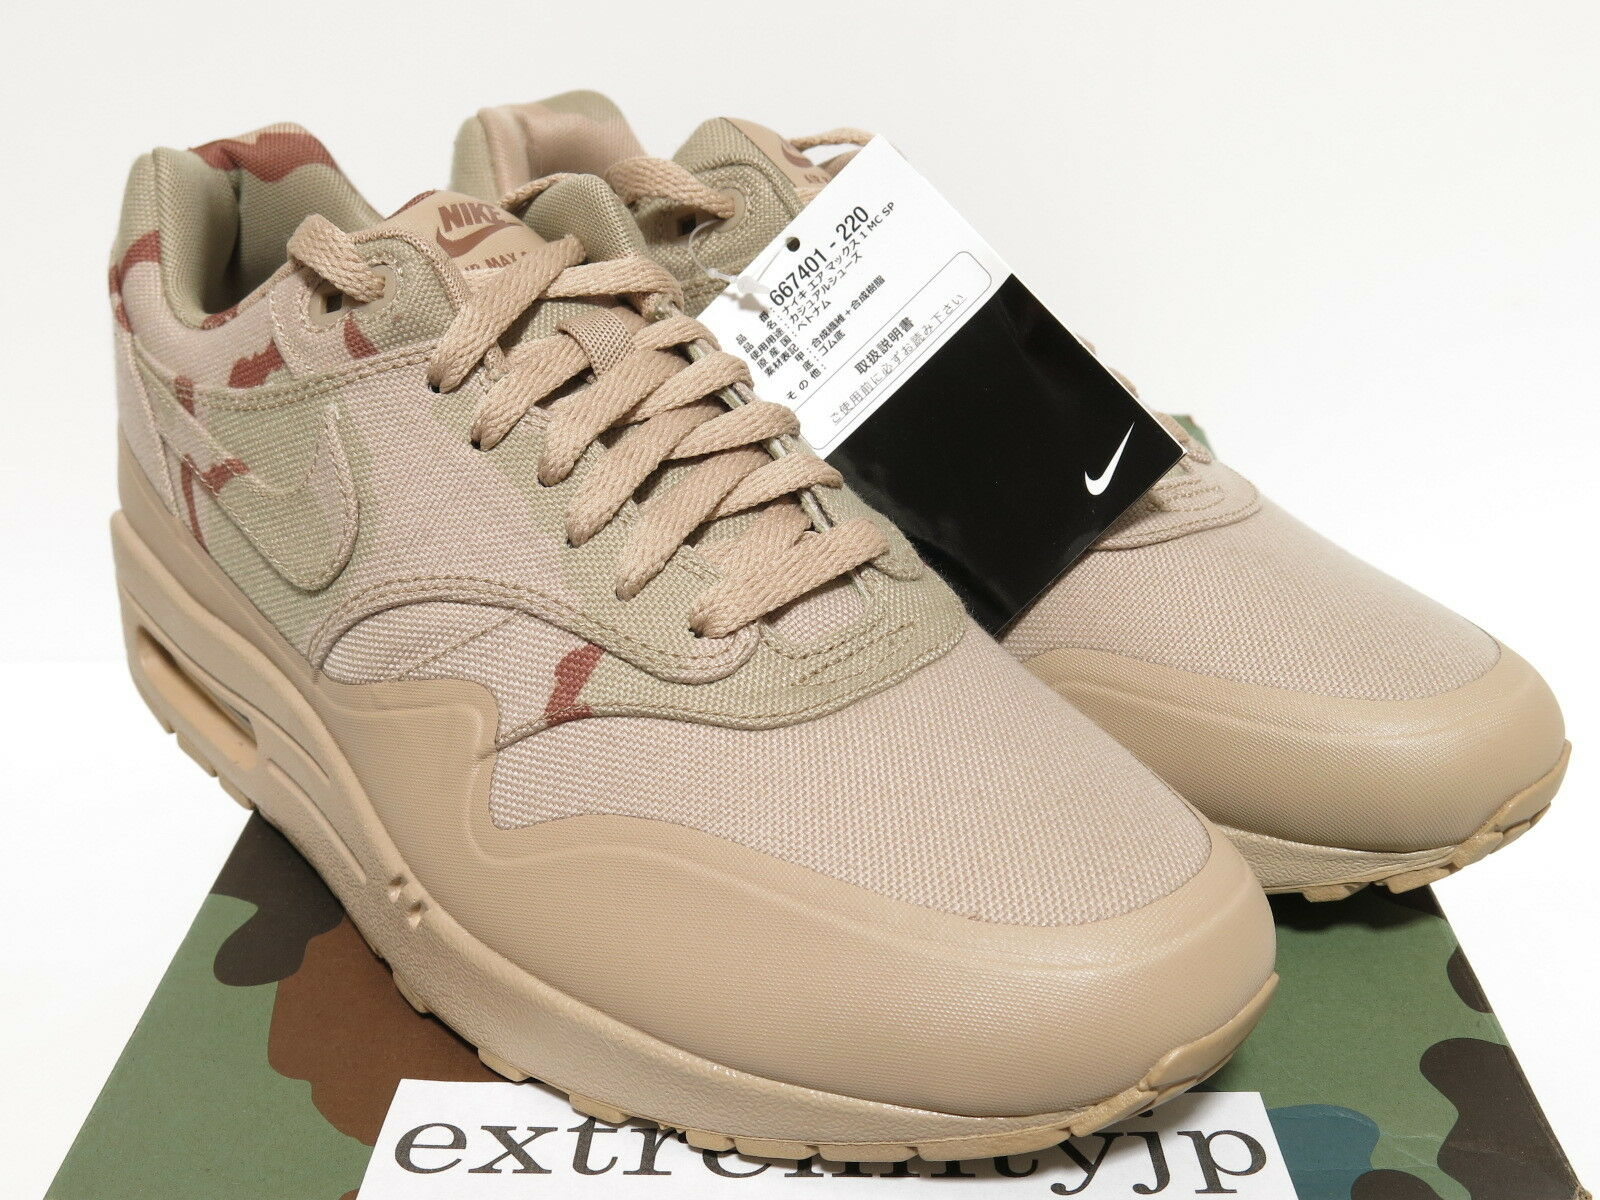 DS 2018 Nike Air Max 1 MC MC MC SP usa Camo arena / arena Bison 667401-220 reducción de precio liquidación estacional d540ef